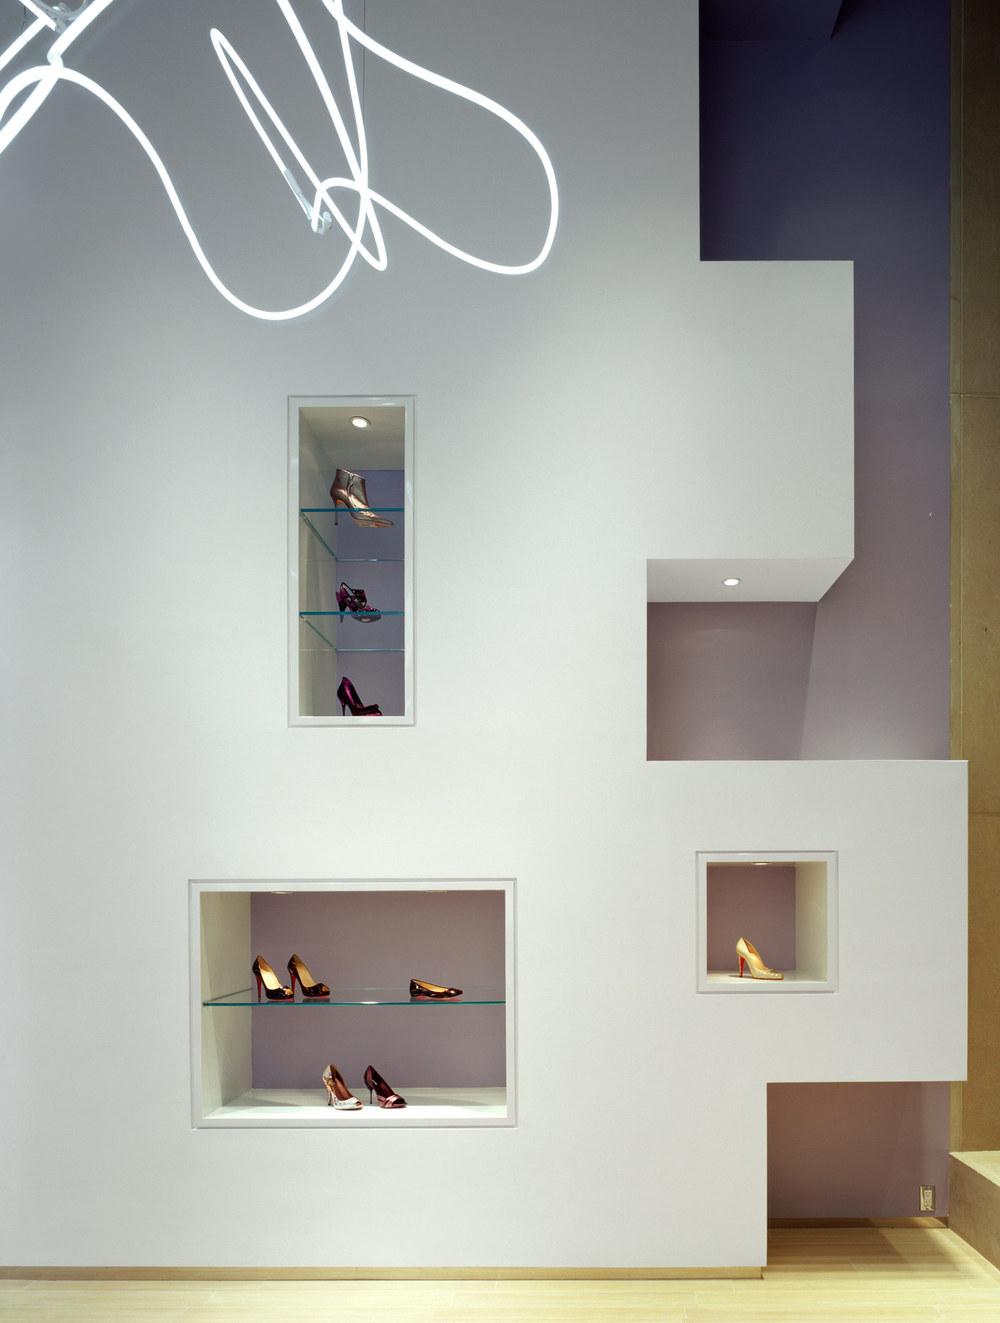 Hirshleifer's Shoe Store